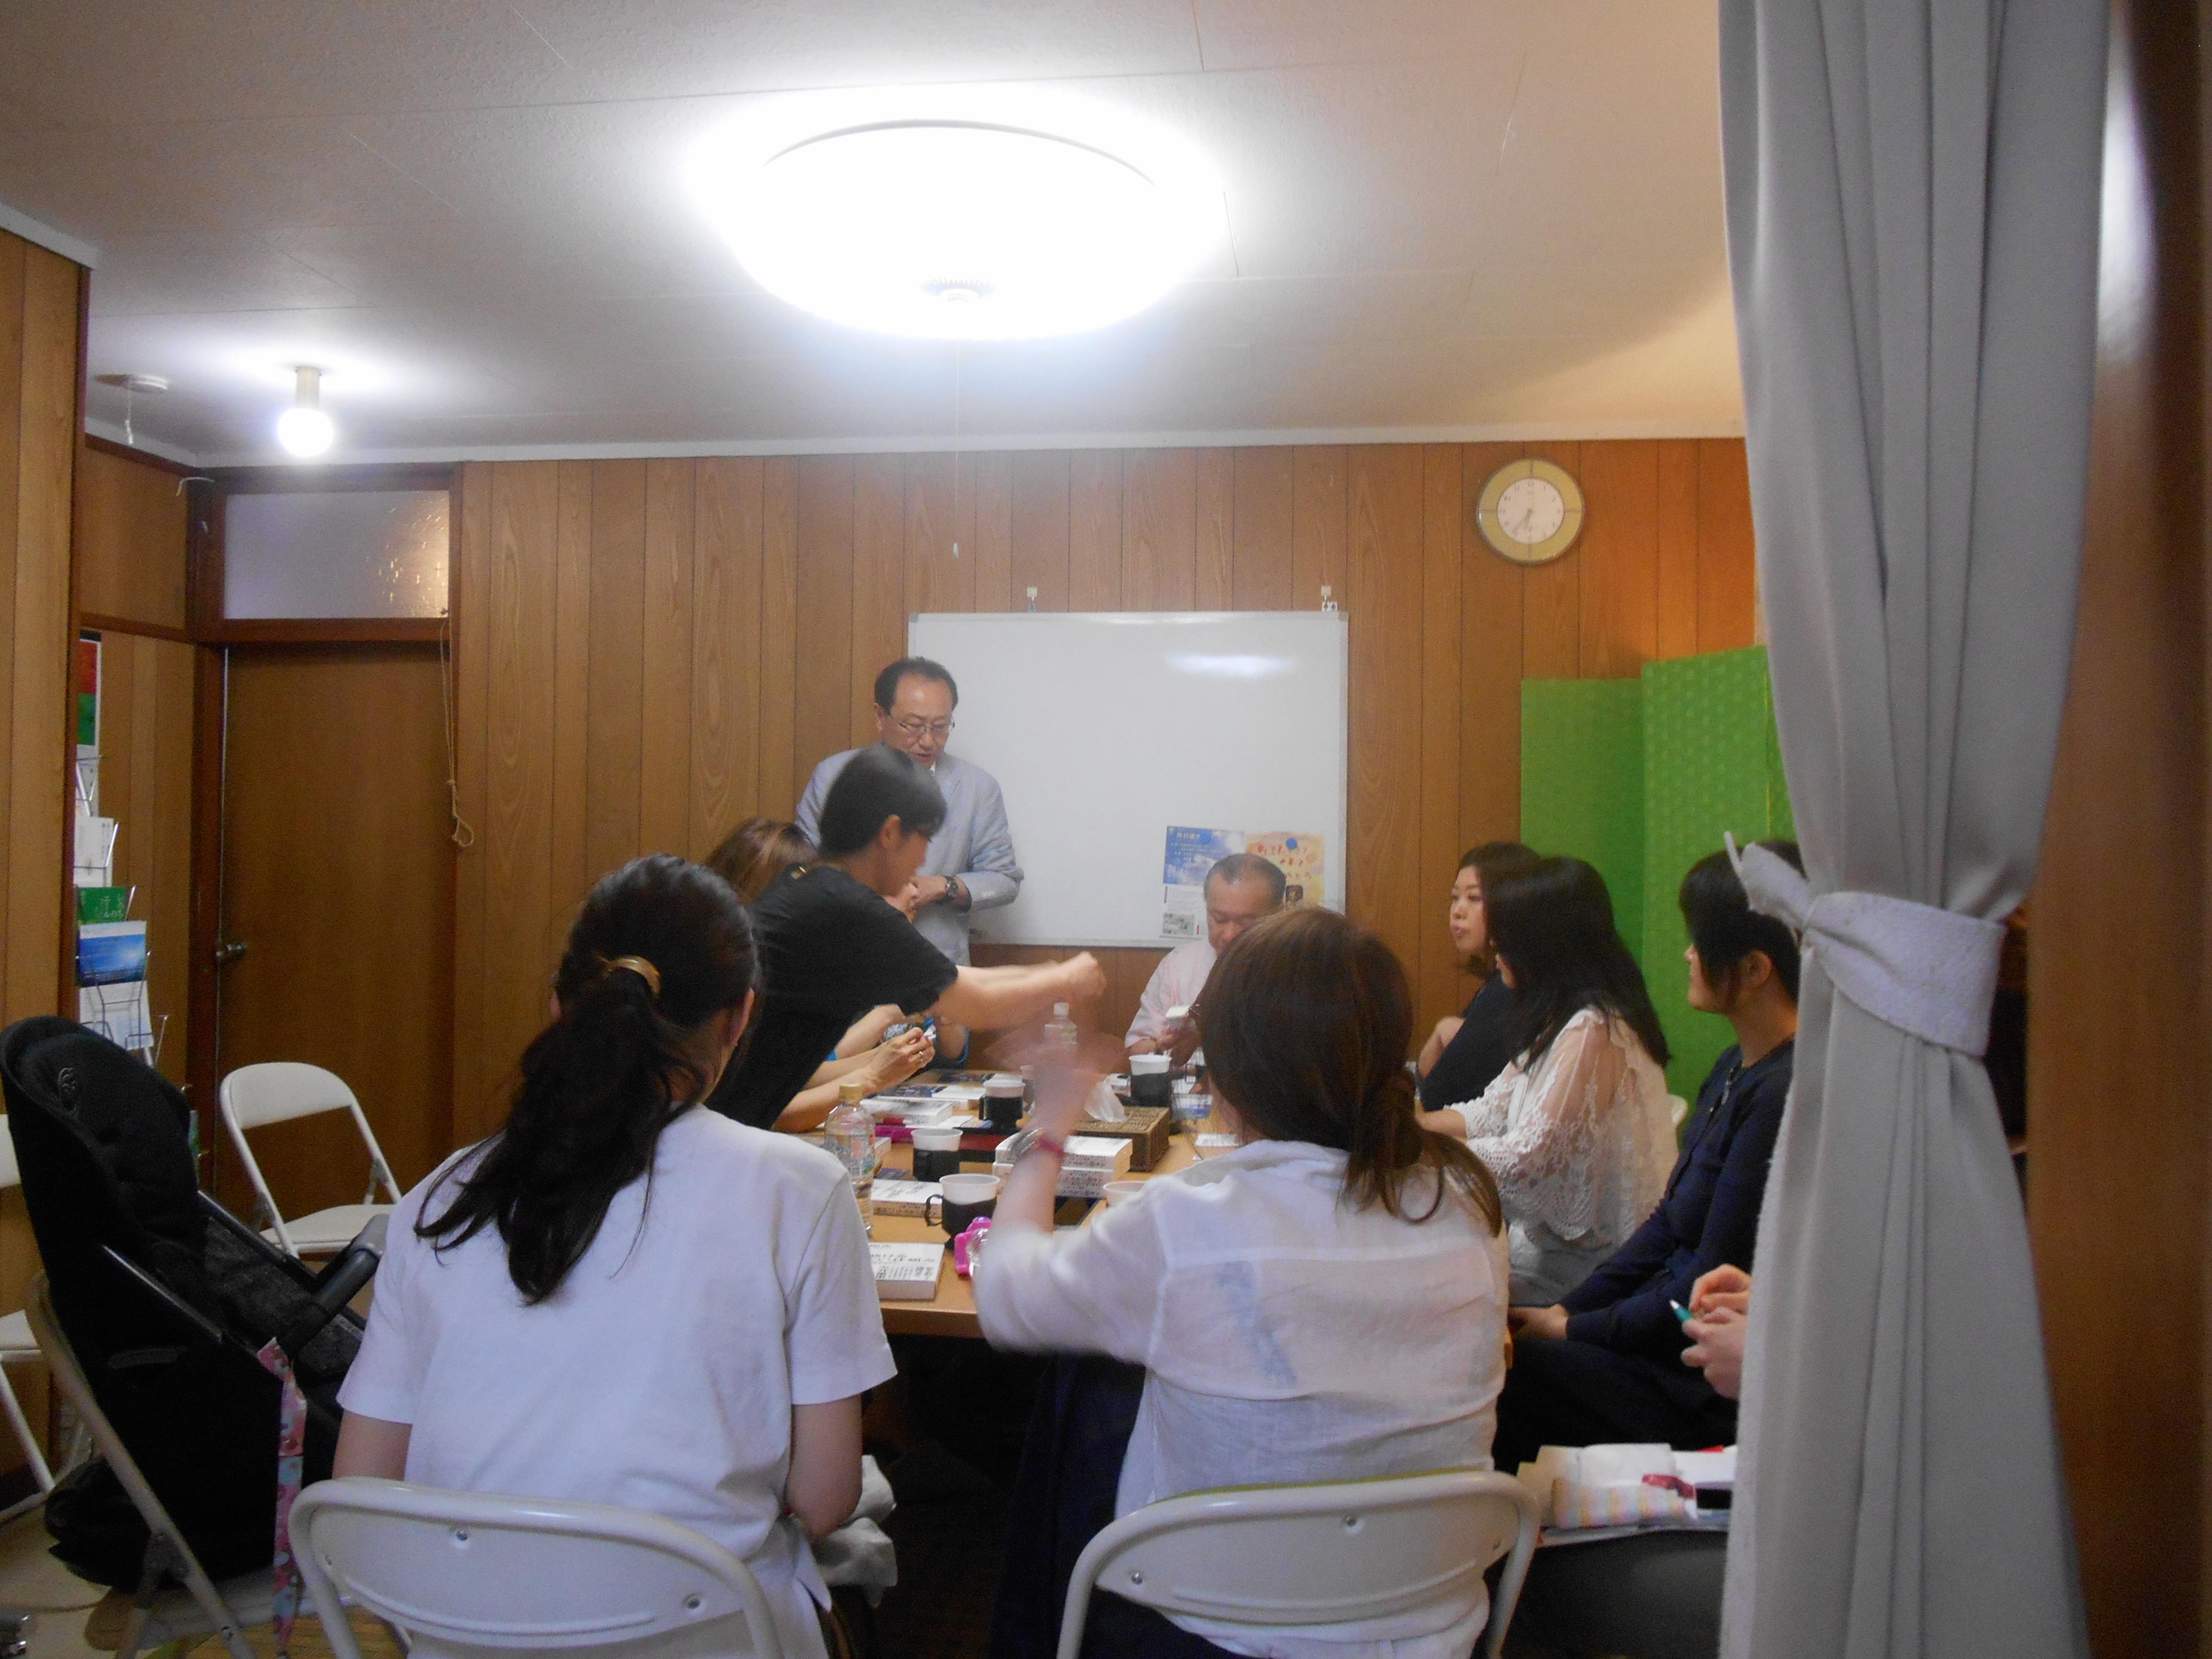 DSCN1641 - 2019年7月16日愛の子育て塾第15期第2講座開催しました。